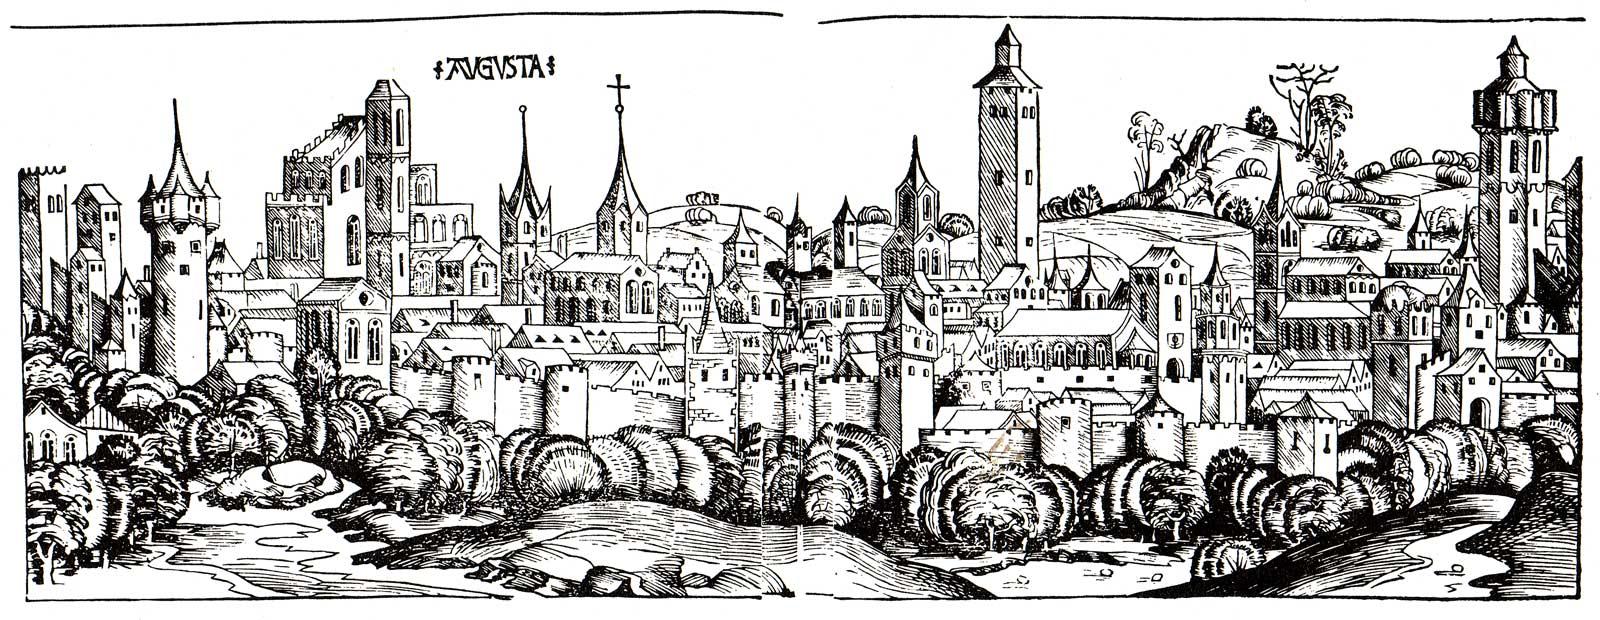 File:Augsburg-1493.jpg